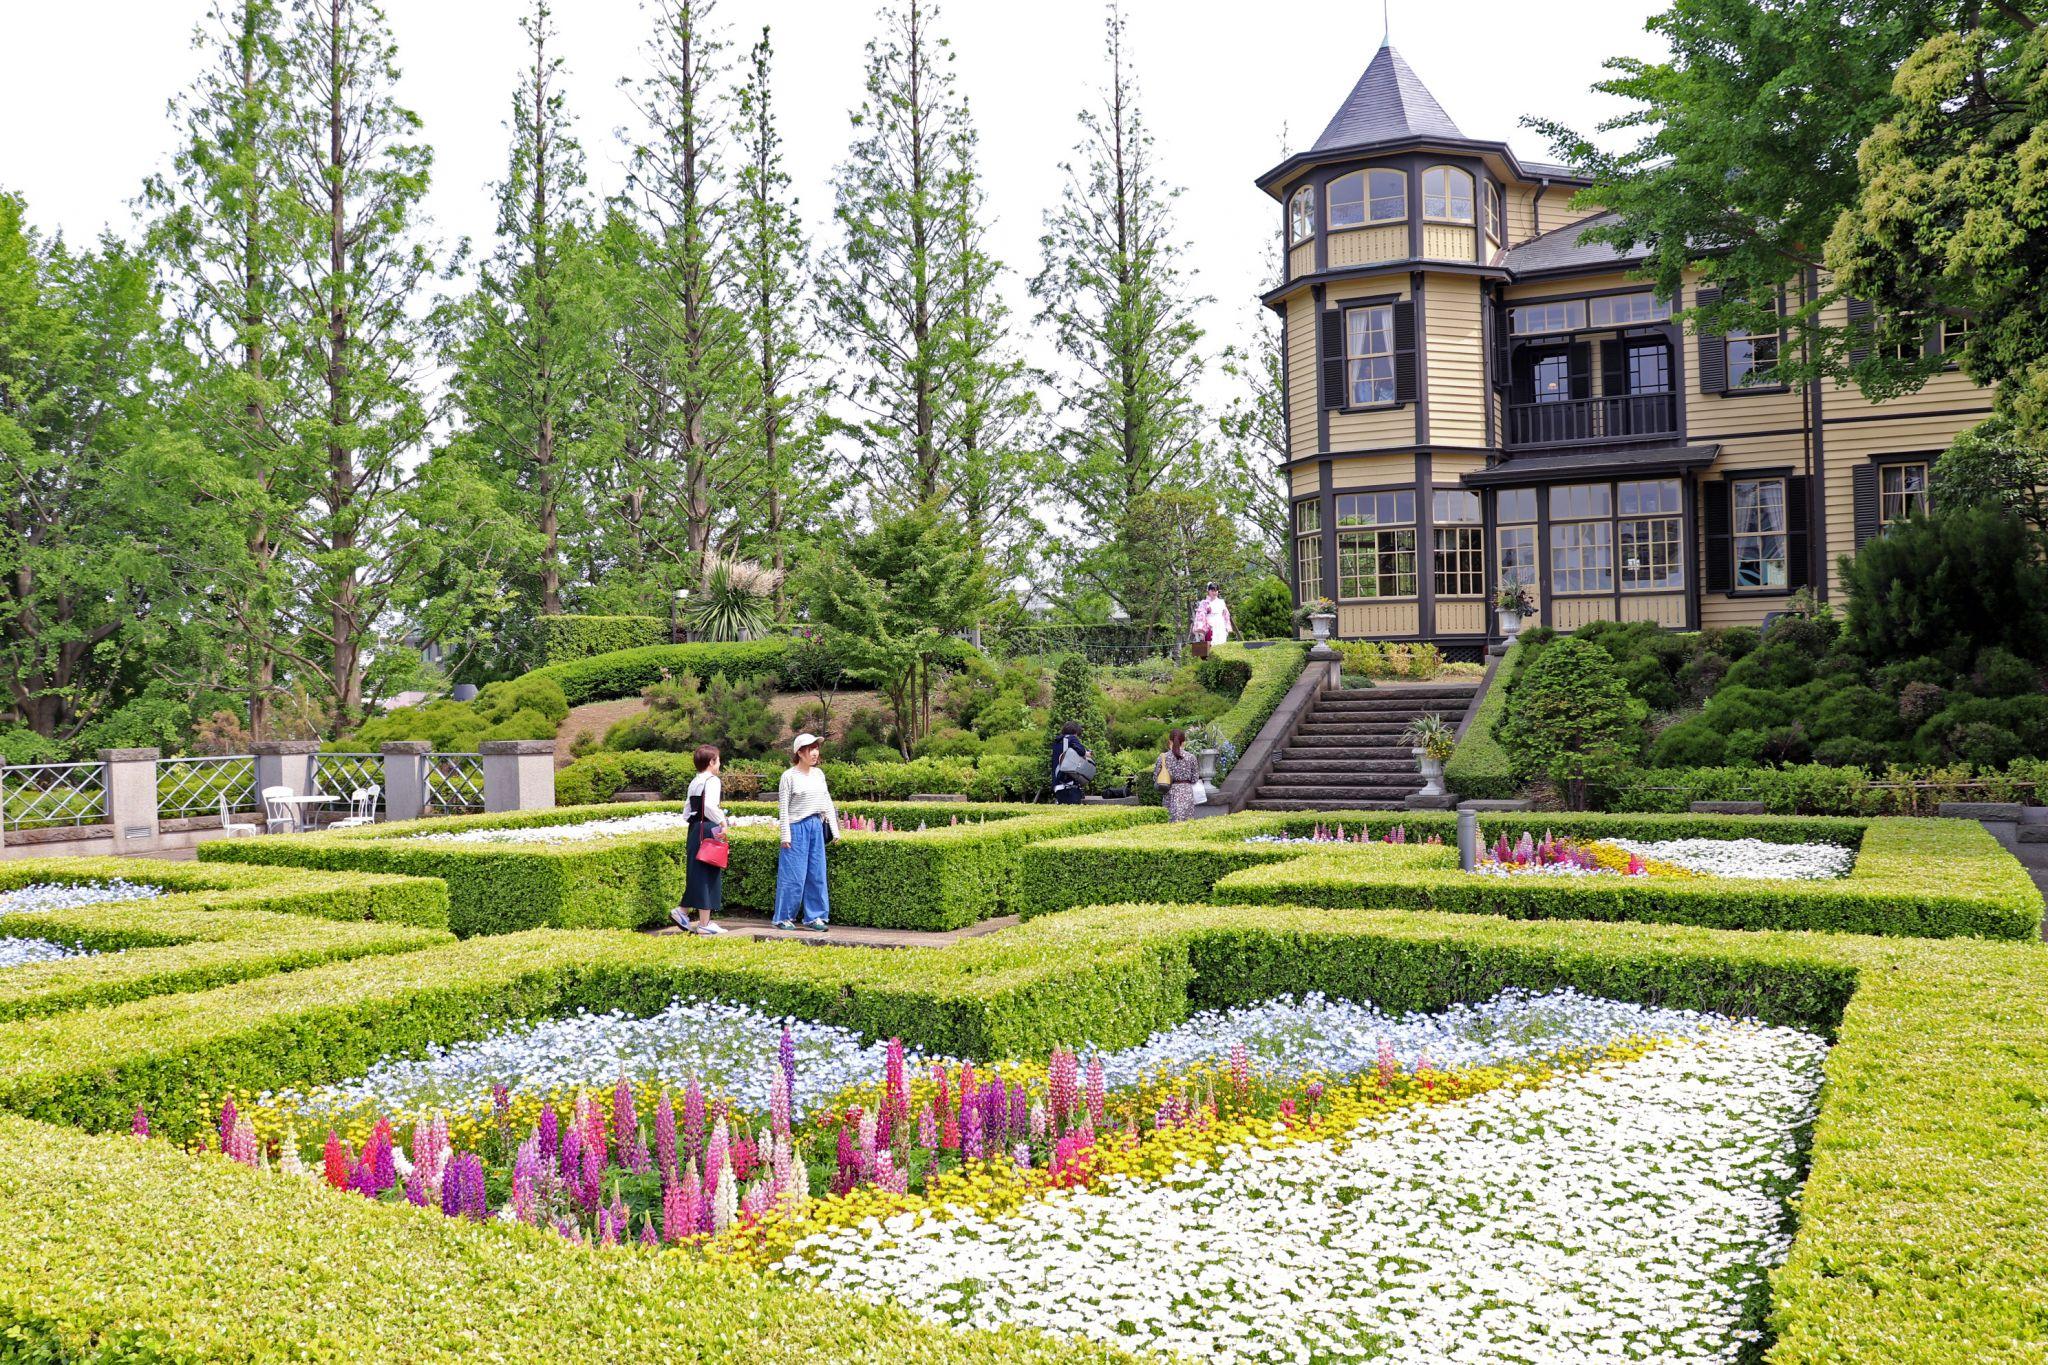 Home of a Diplomat, Gaiko-kan no ie, Japan